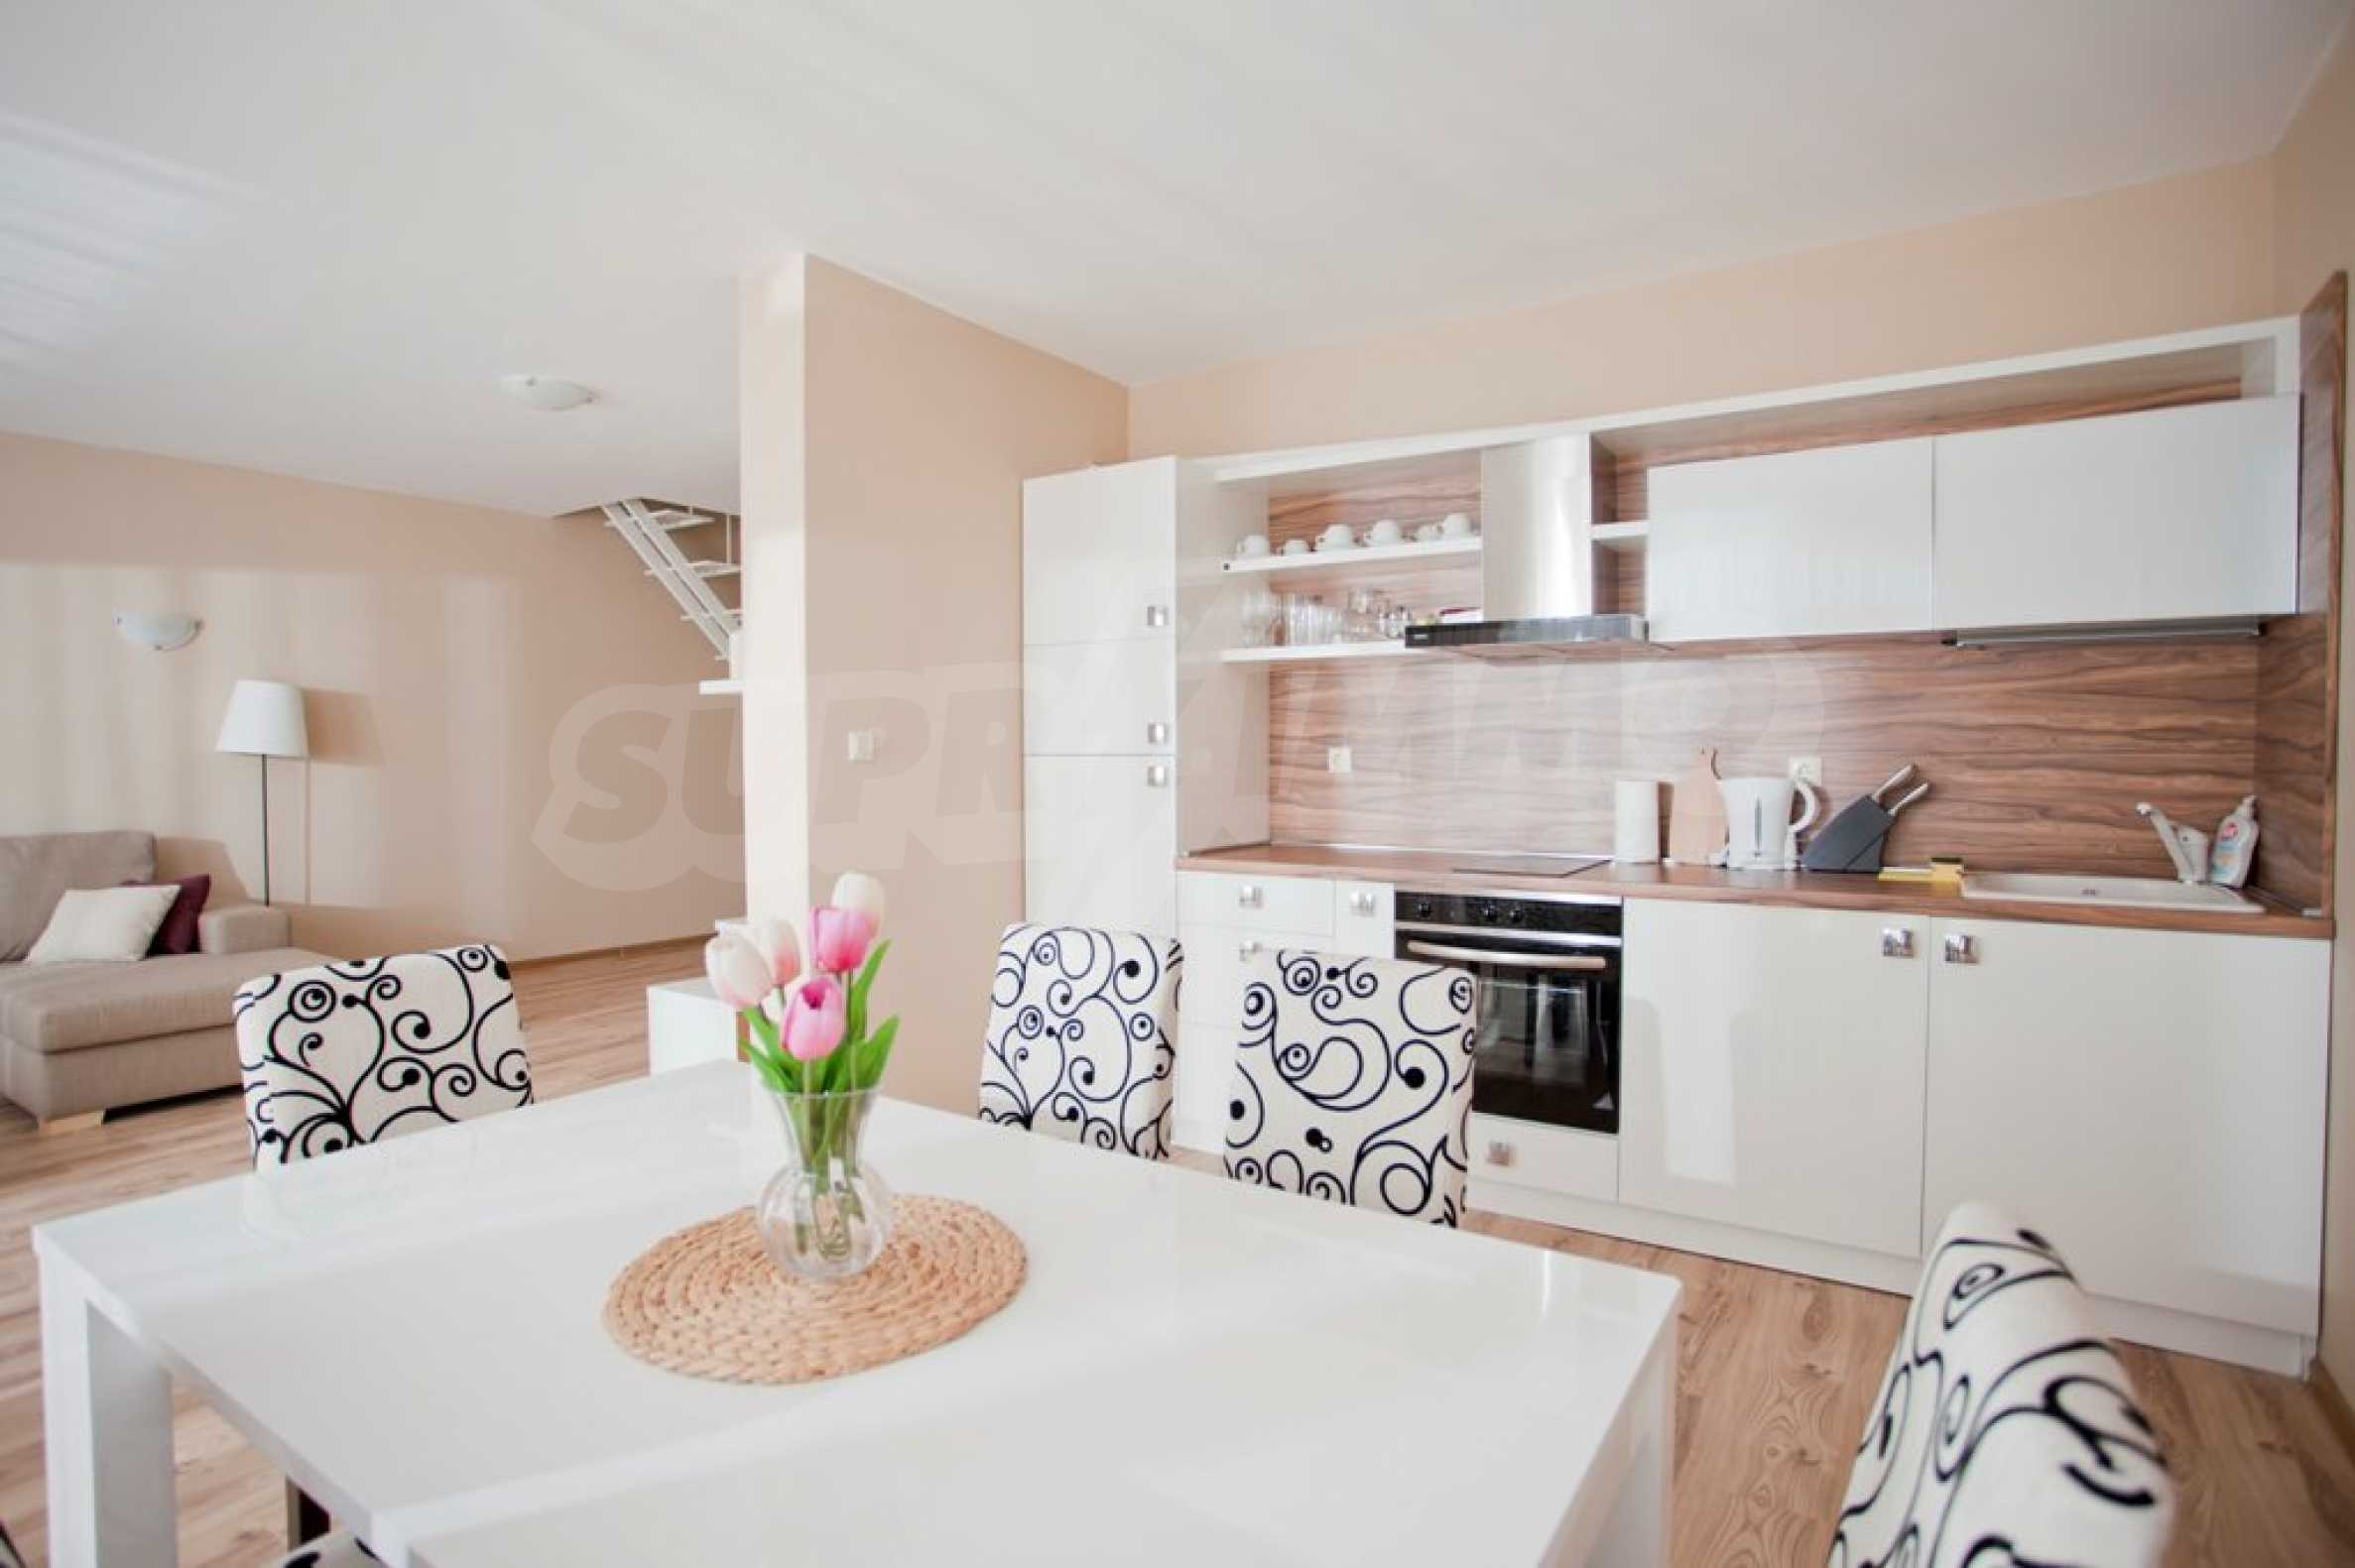 New apartment complex Atia resort in Chernomorets 21